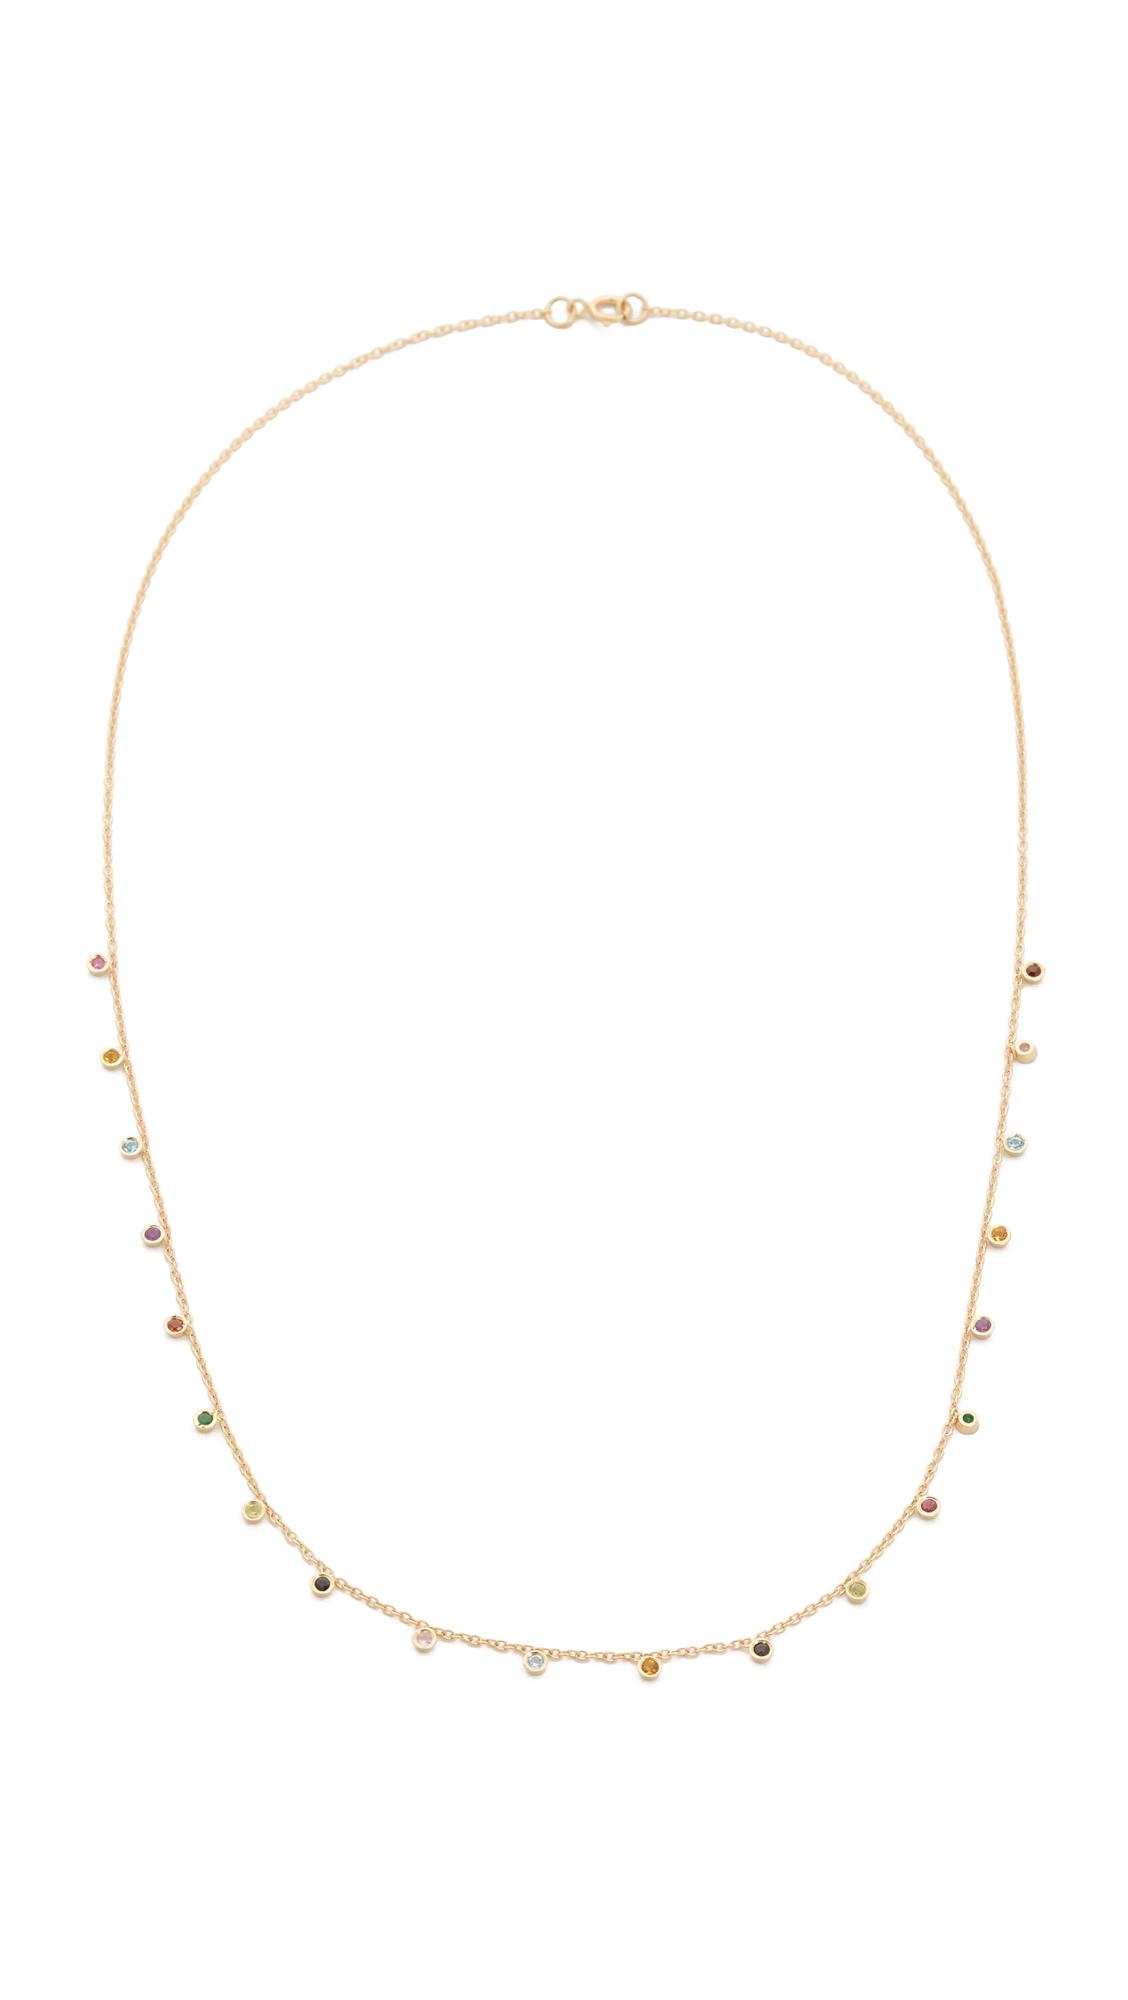 Ariel Gordon Jewelry 14k Gold Candy Crush Necklace - Gold Multi